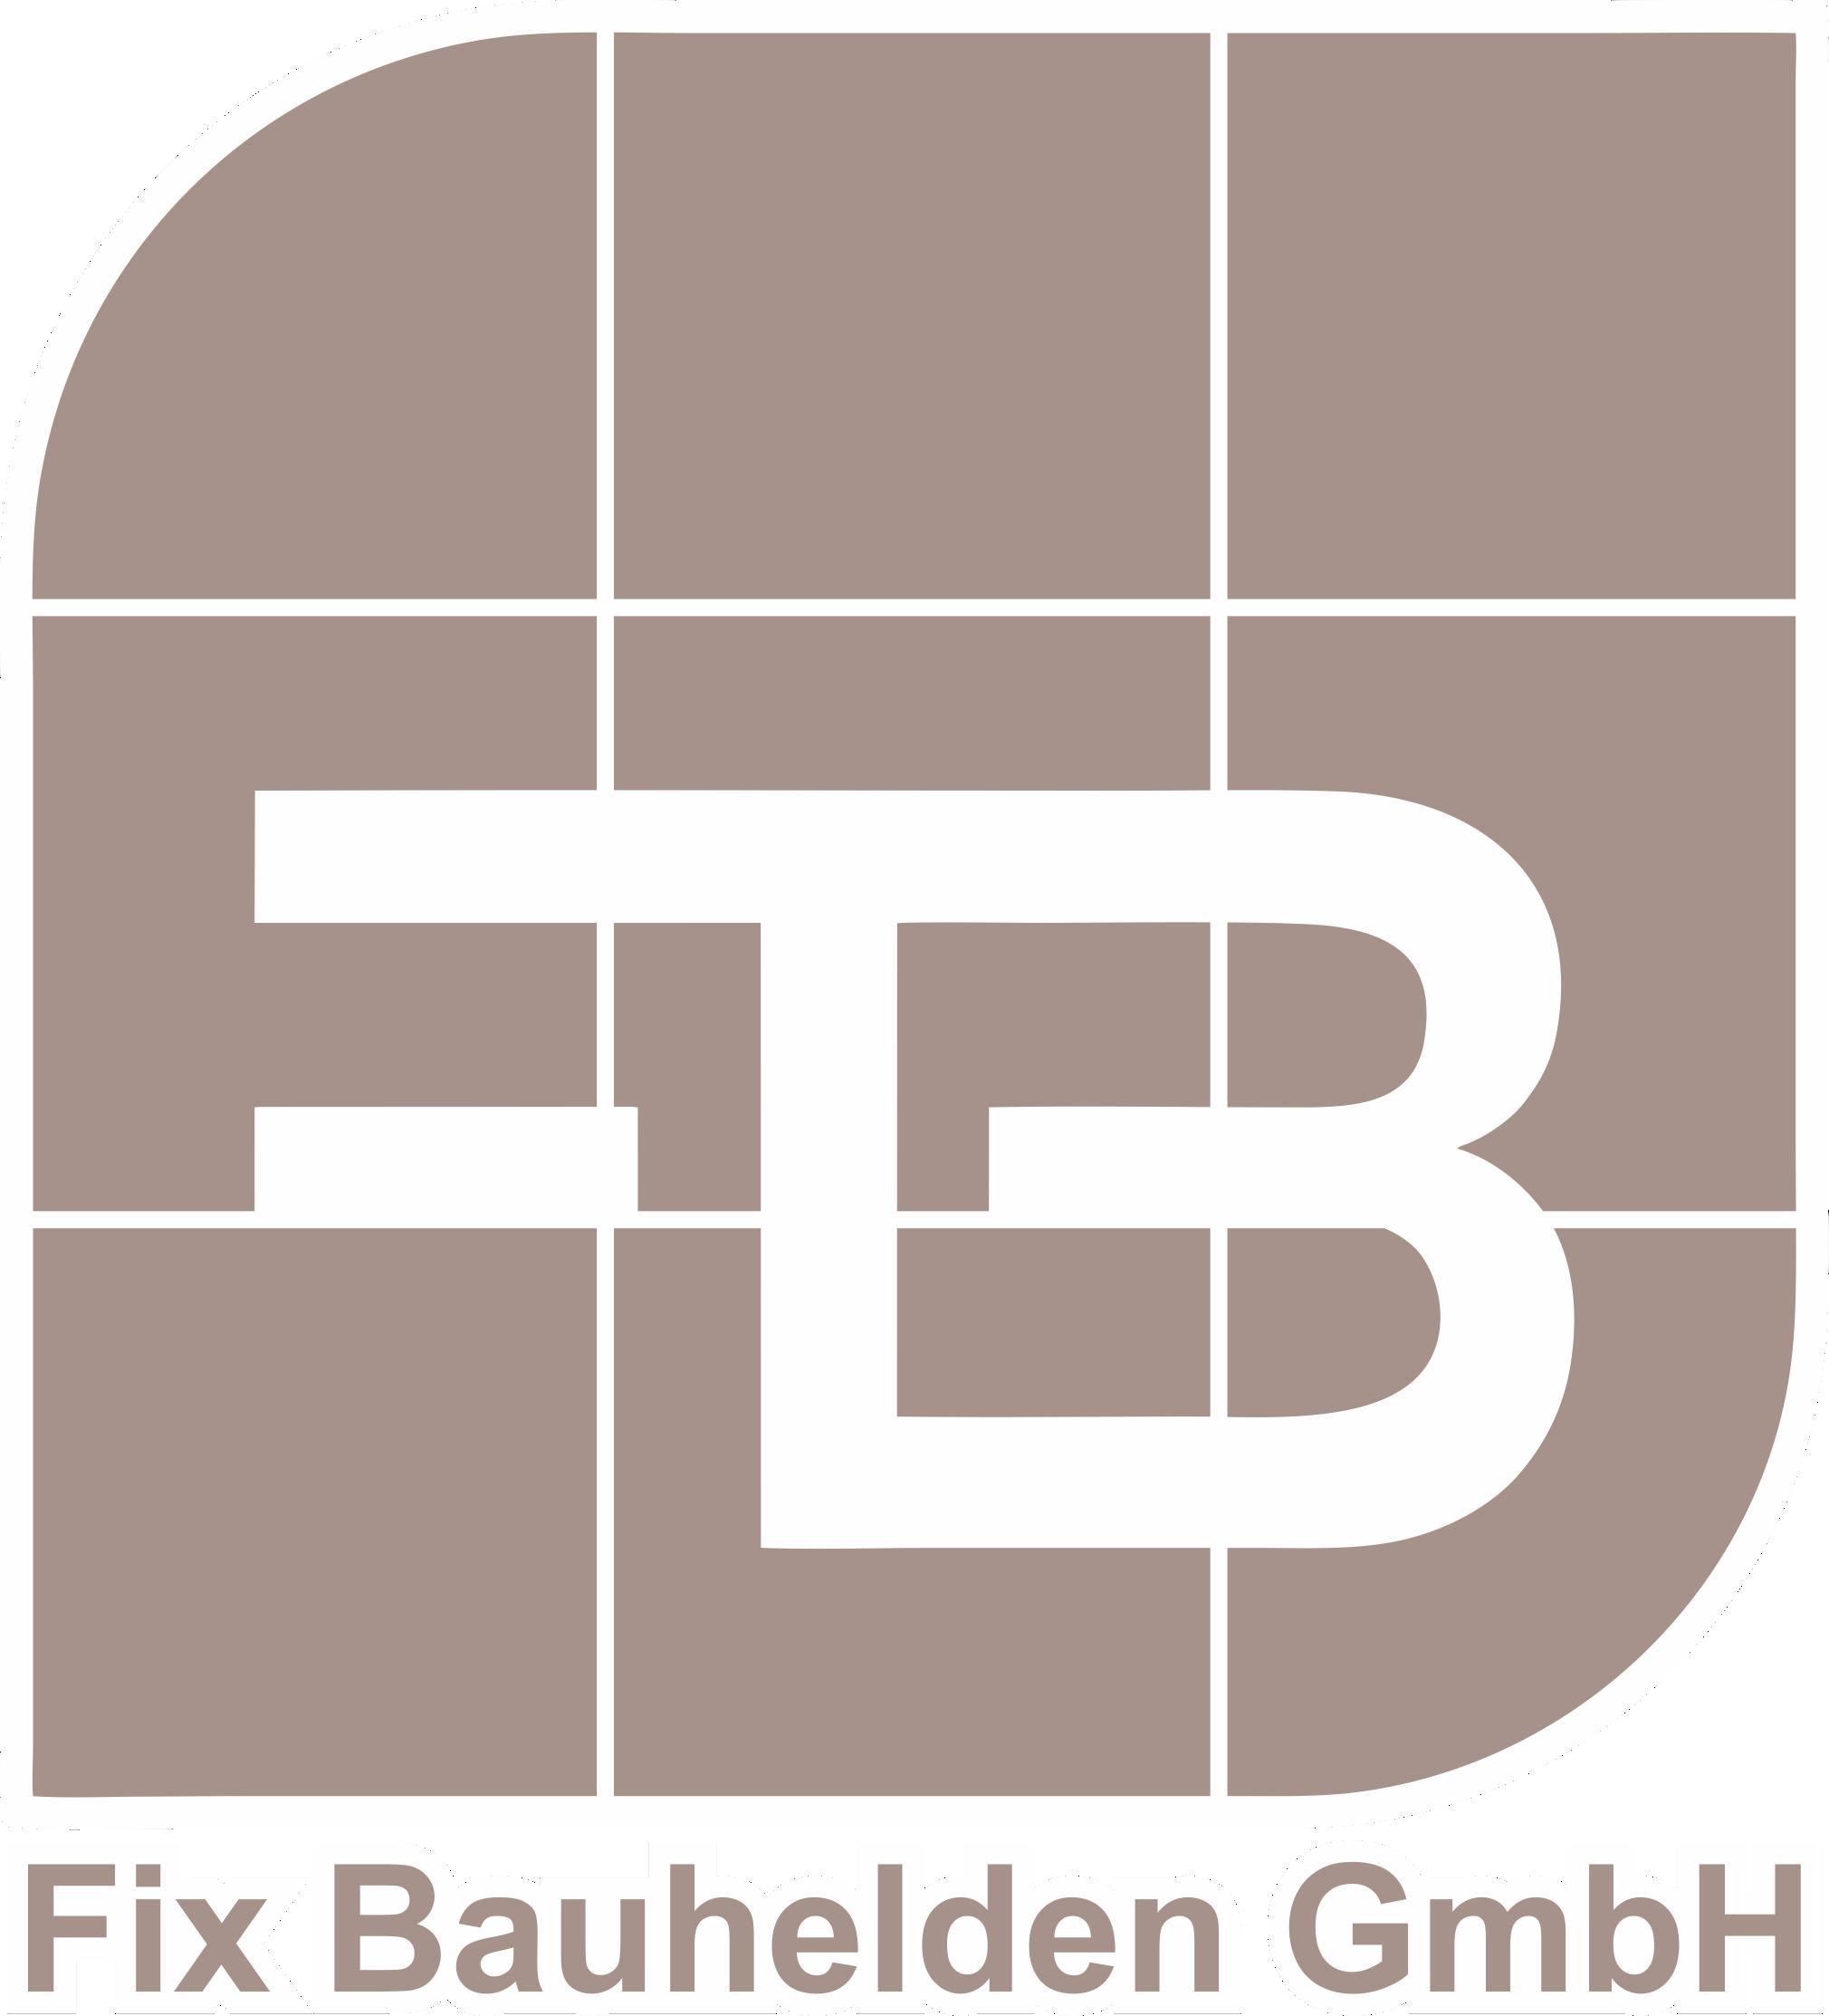 Fix Bauhelden GmbH